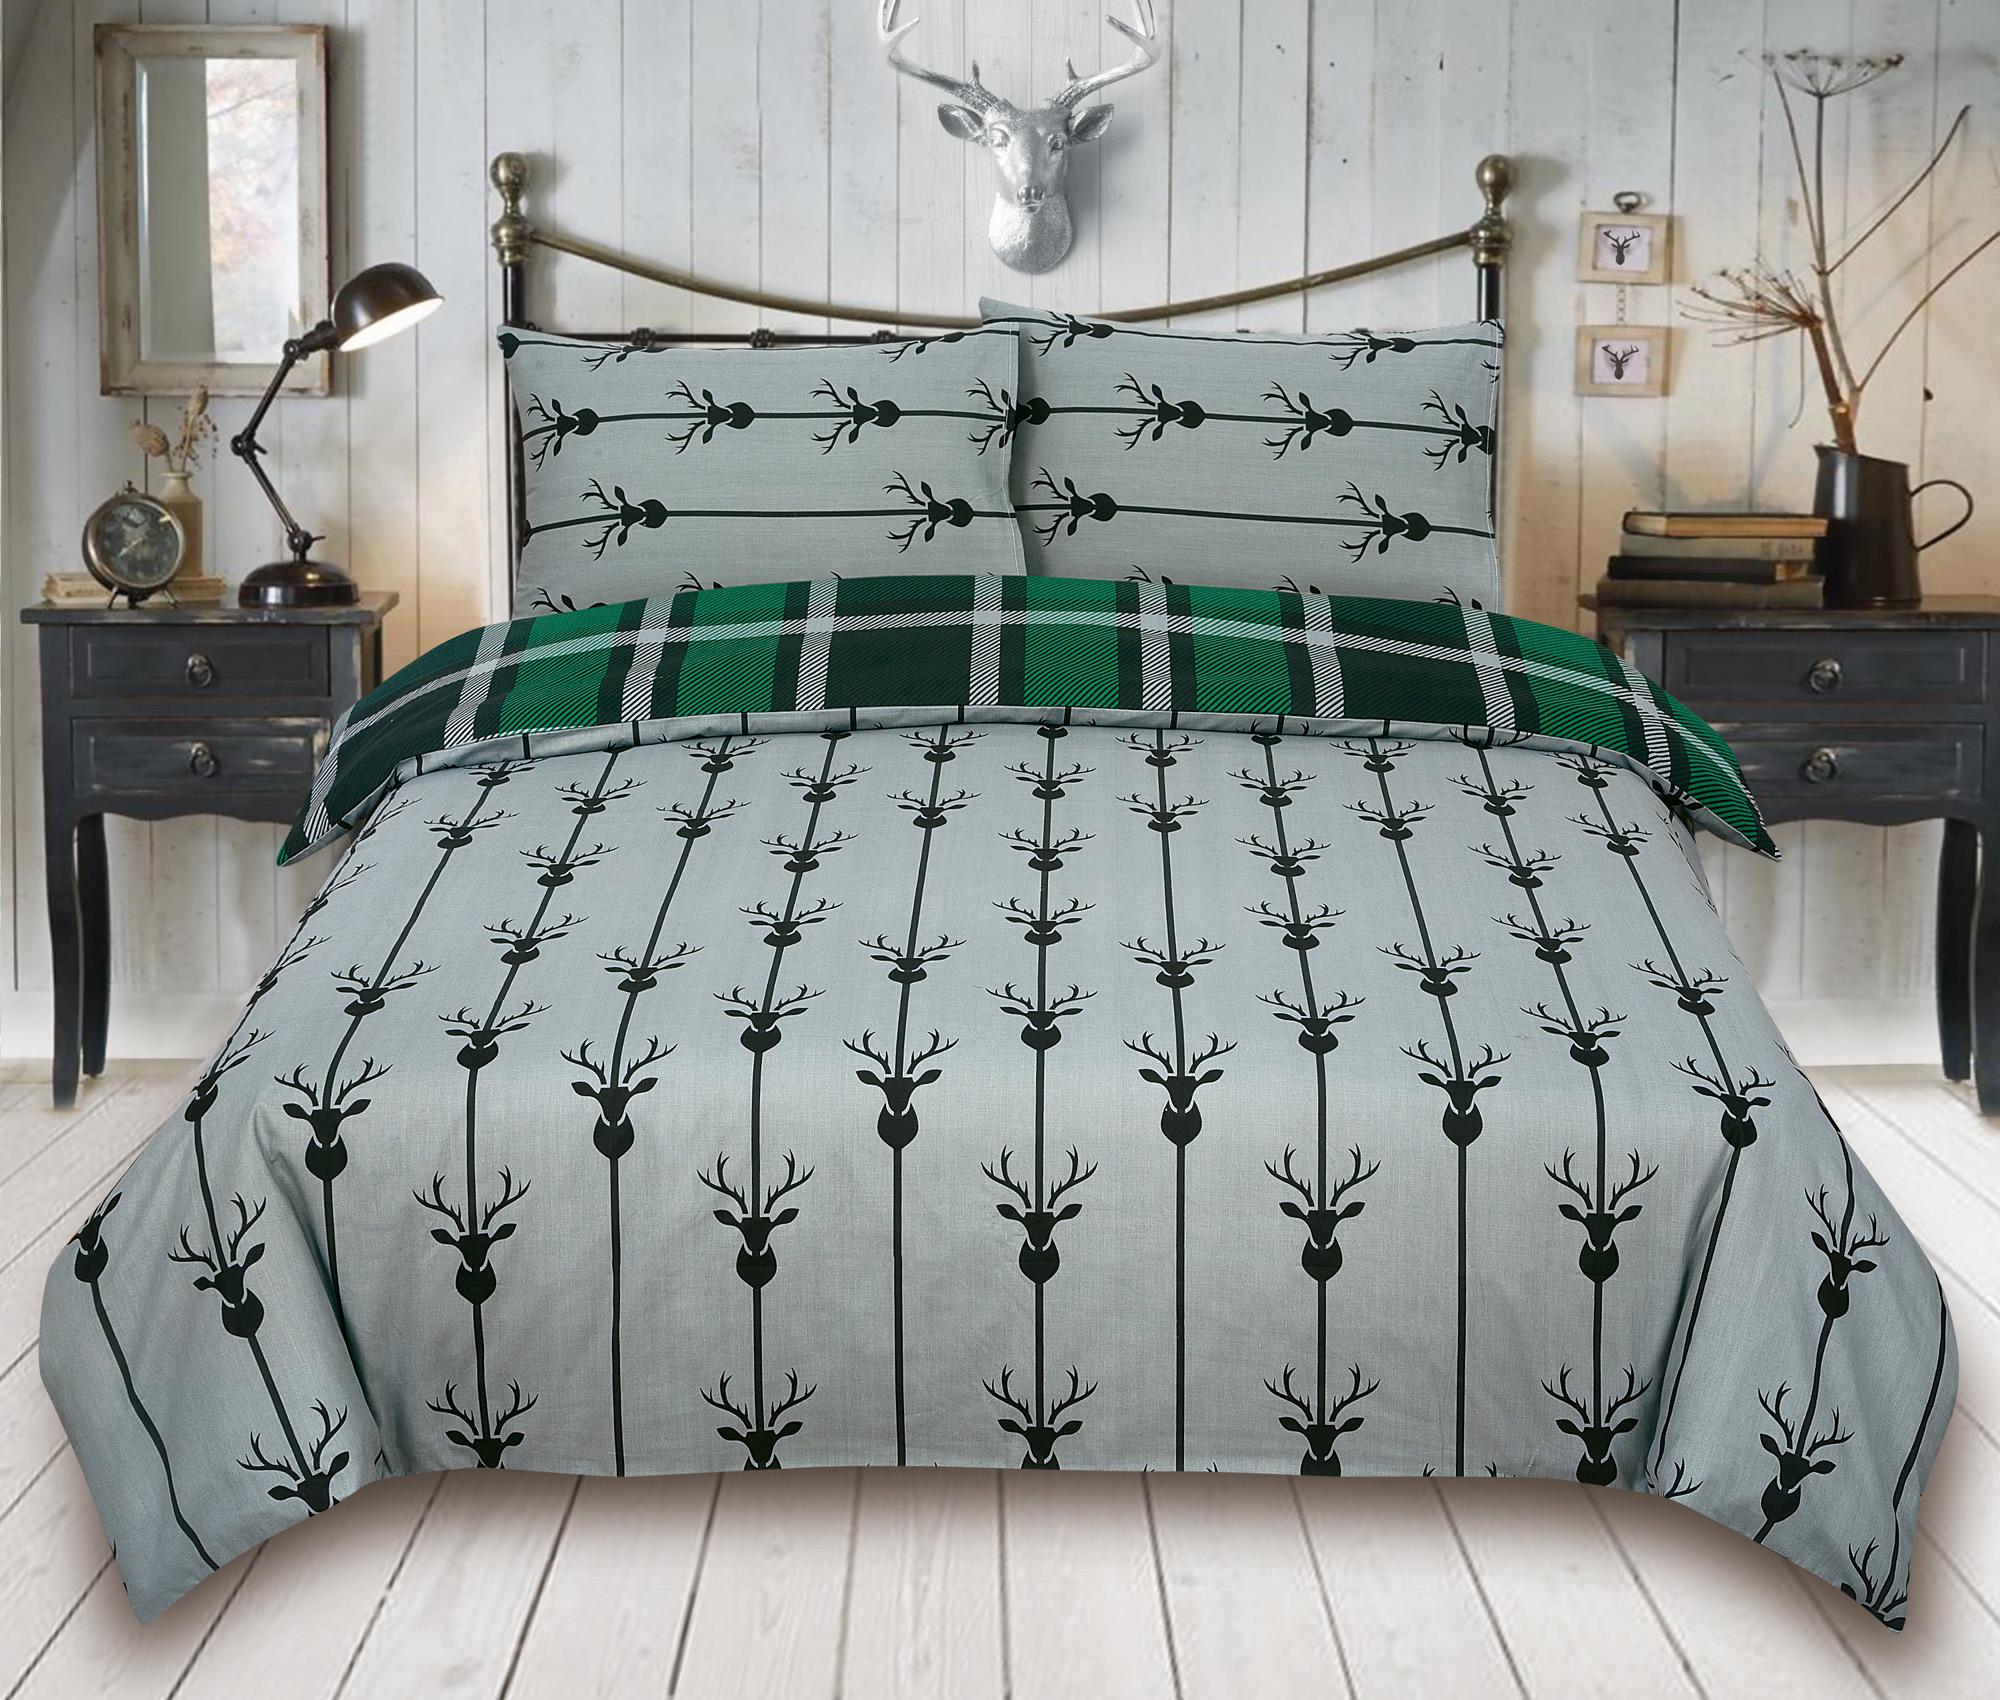 Check-Stag-Tartan-Deer-Antlers-Bedding-Single-Double-King-Duvet-Quilt-Cover-Set miniatura 13